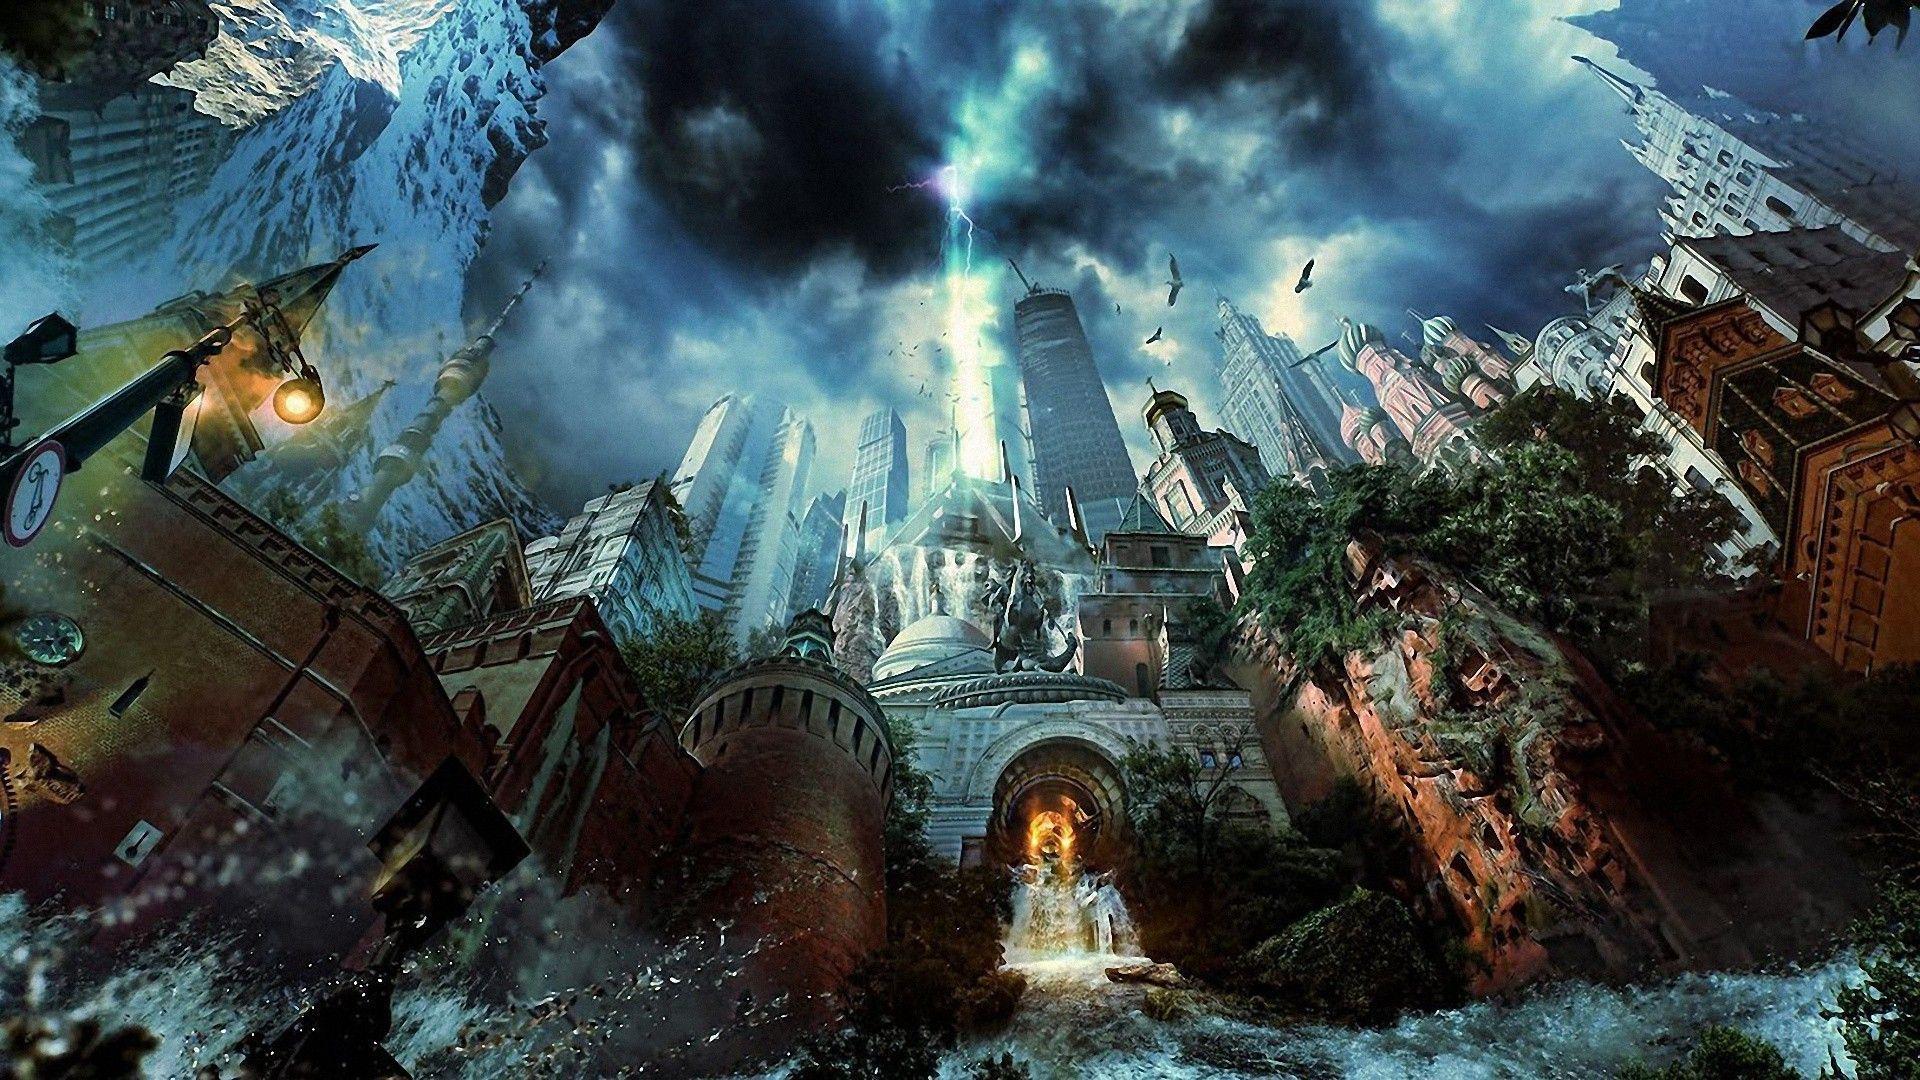 Fantasy Wallpapers 1080p - Wallpaper Cave